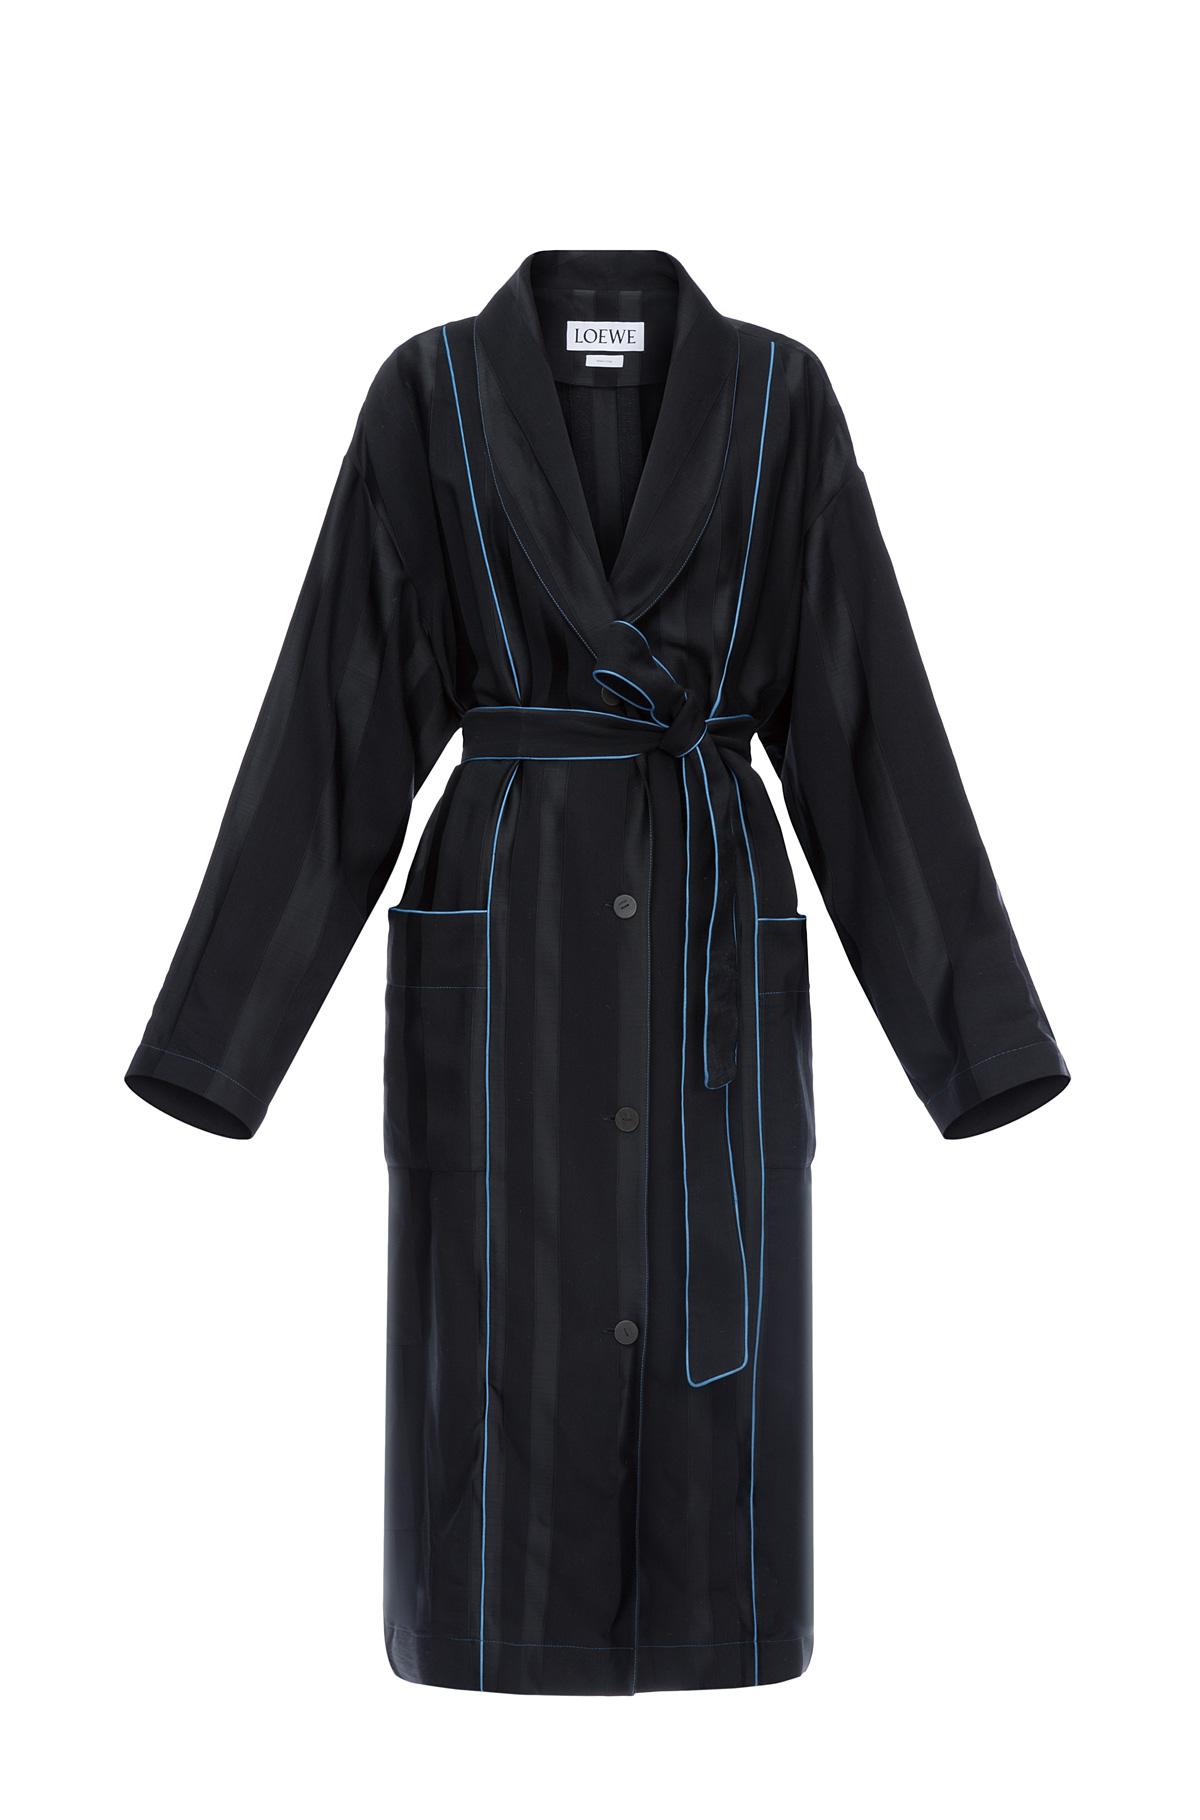 LOEWE Duster Coat Black/Blue front